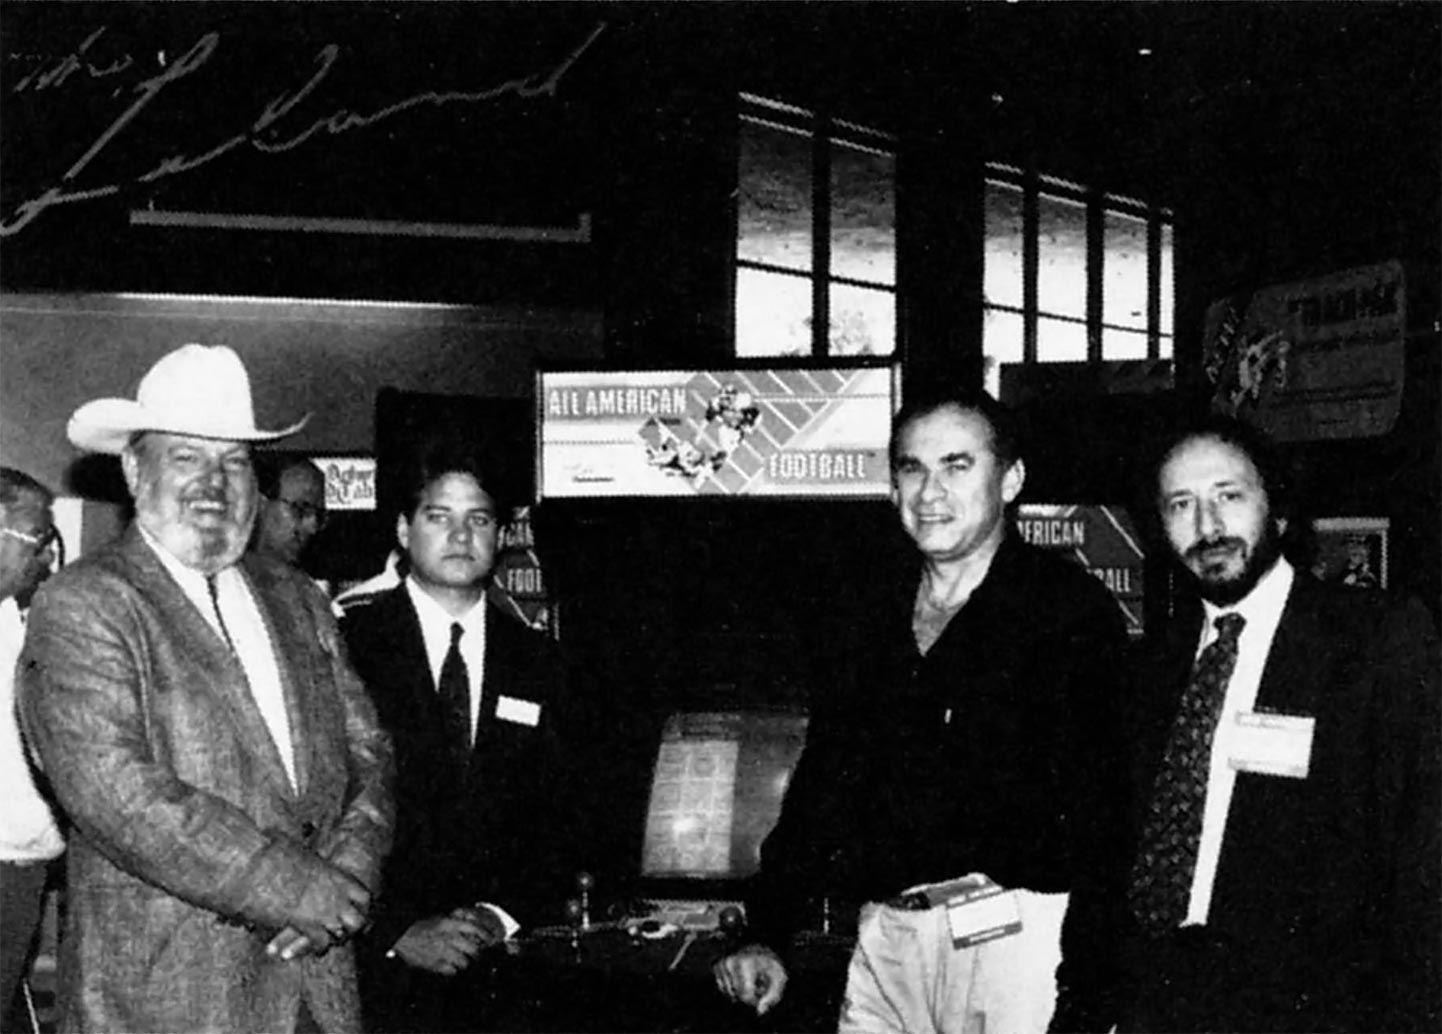 Leland Cook, arcade video game manufacturer